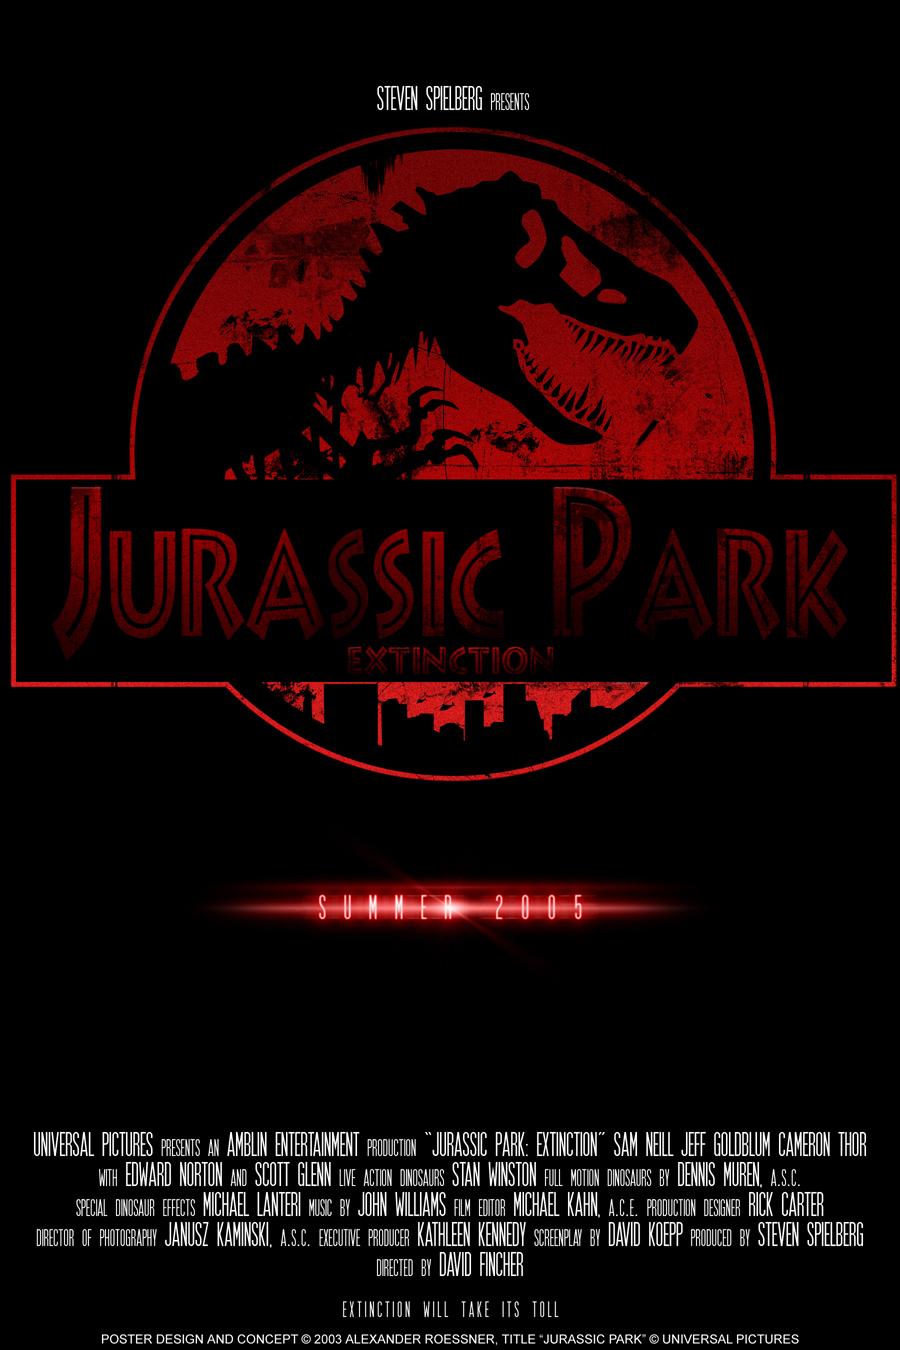 jurassic park 4 logo